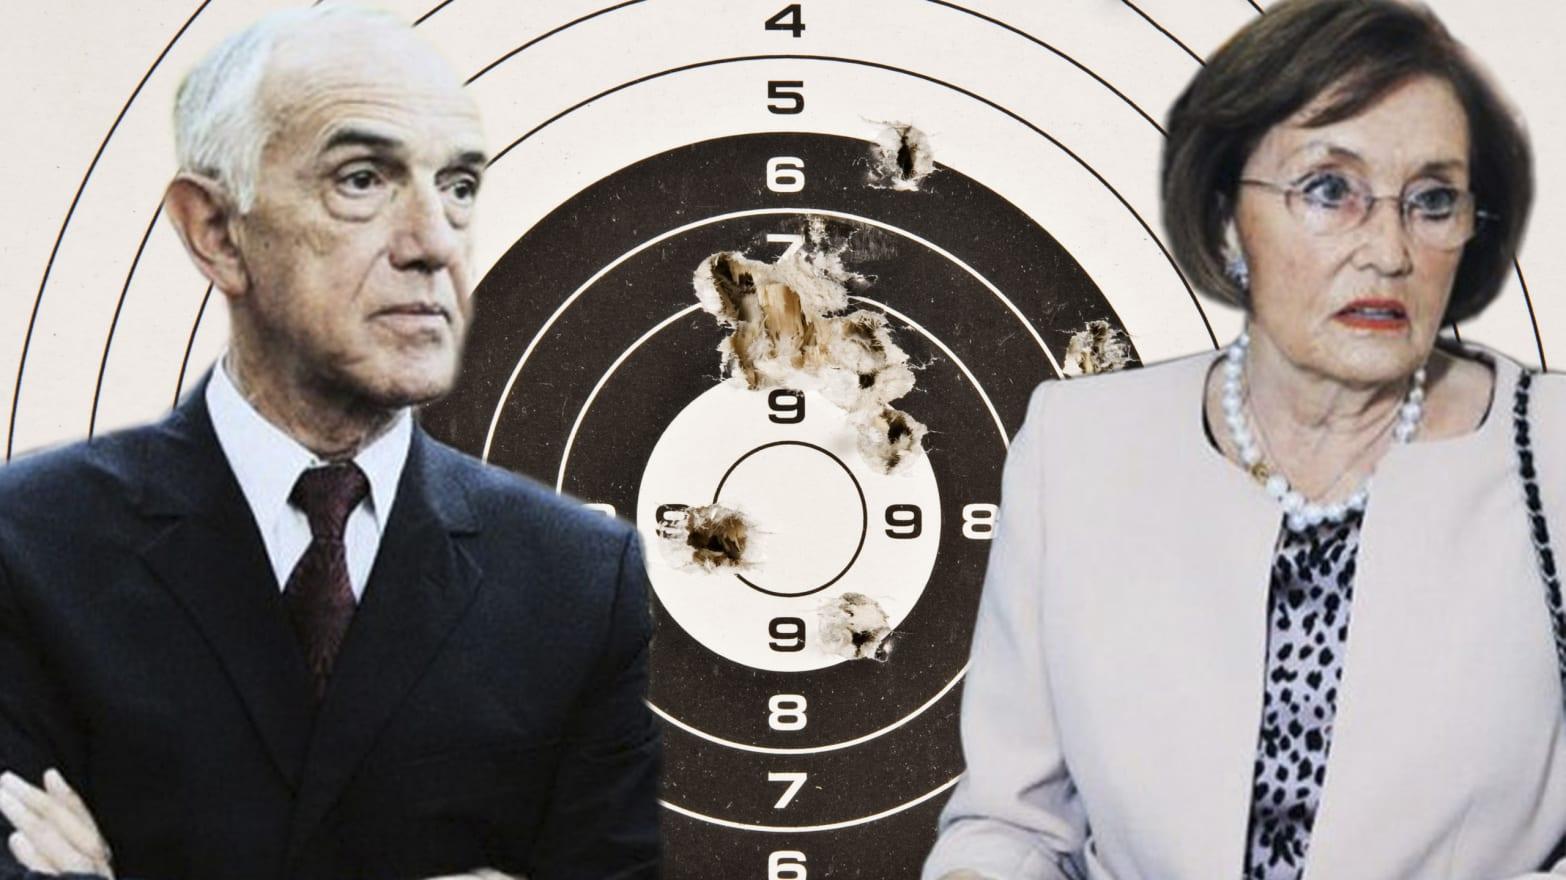 Glock Founder Puts Bullseye on Ex-Wife